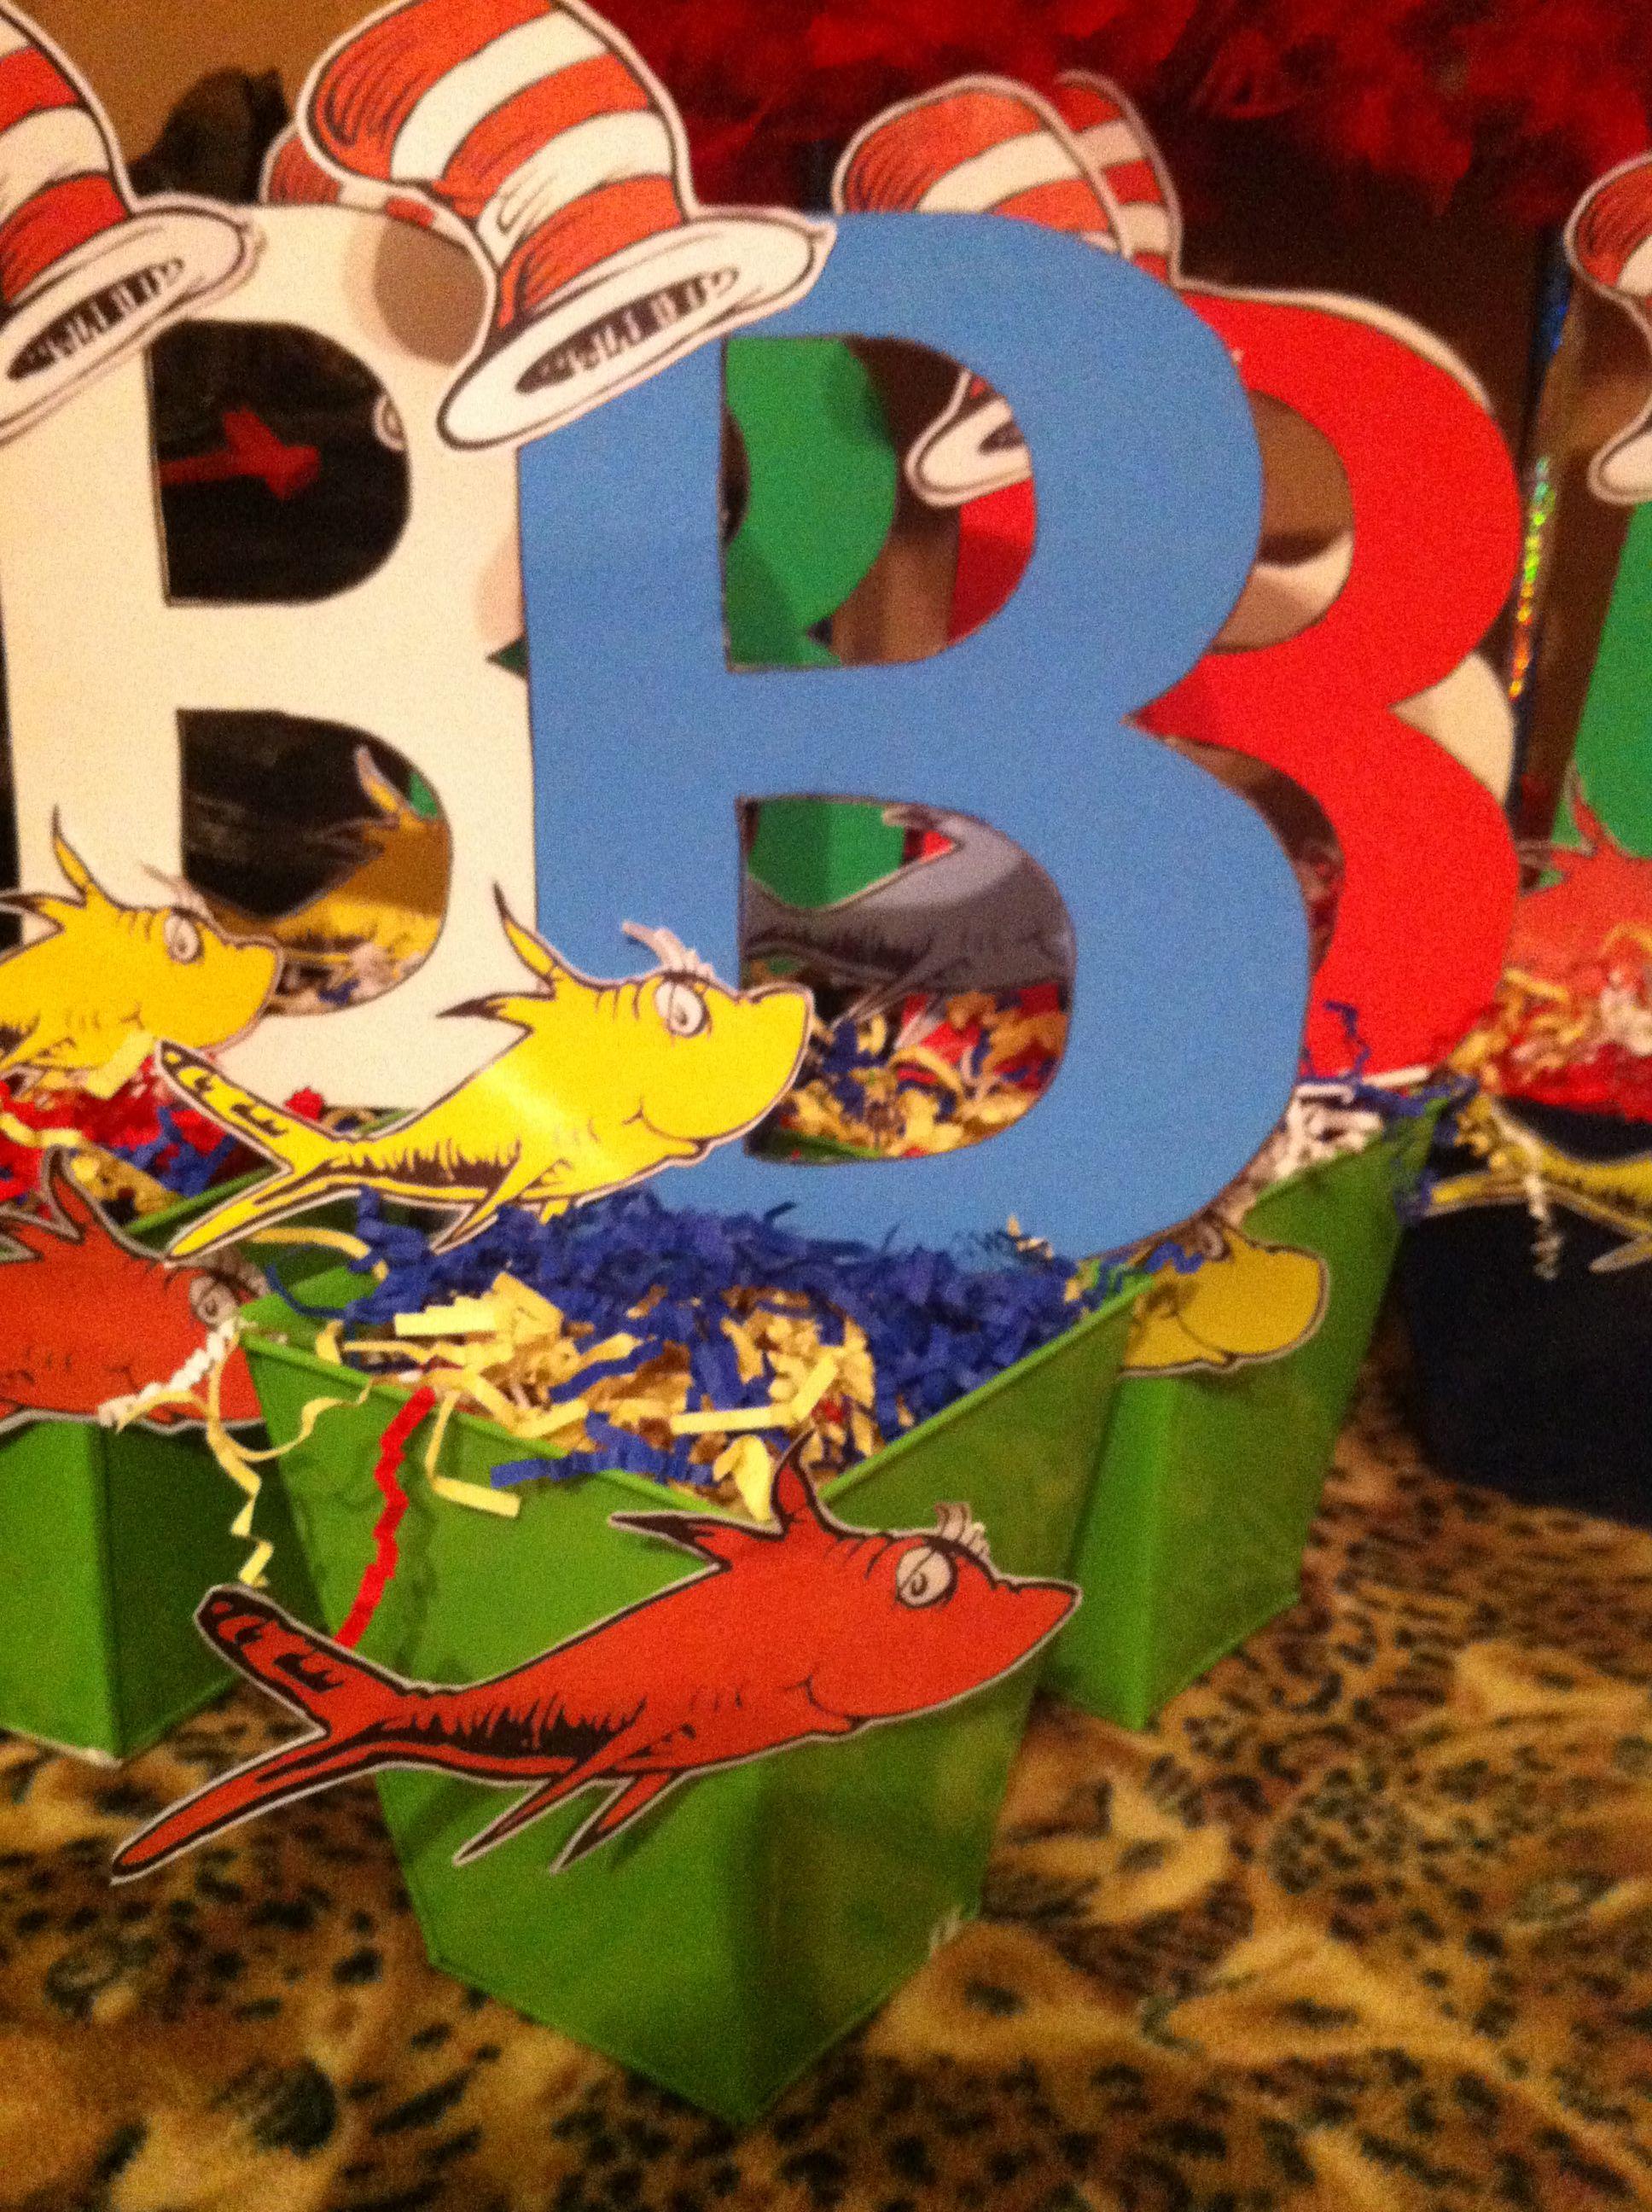 My Dr. Seuss baby shower centerpieces   My stuff ...